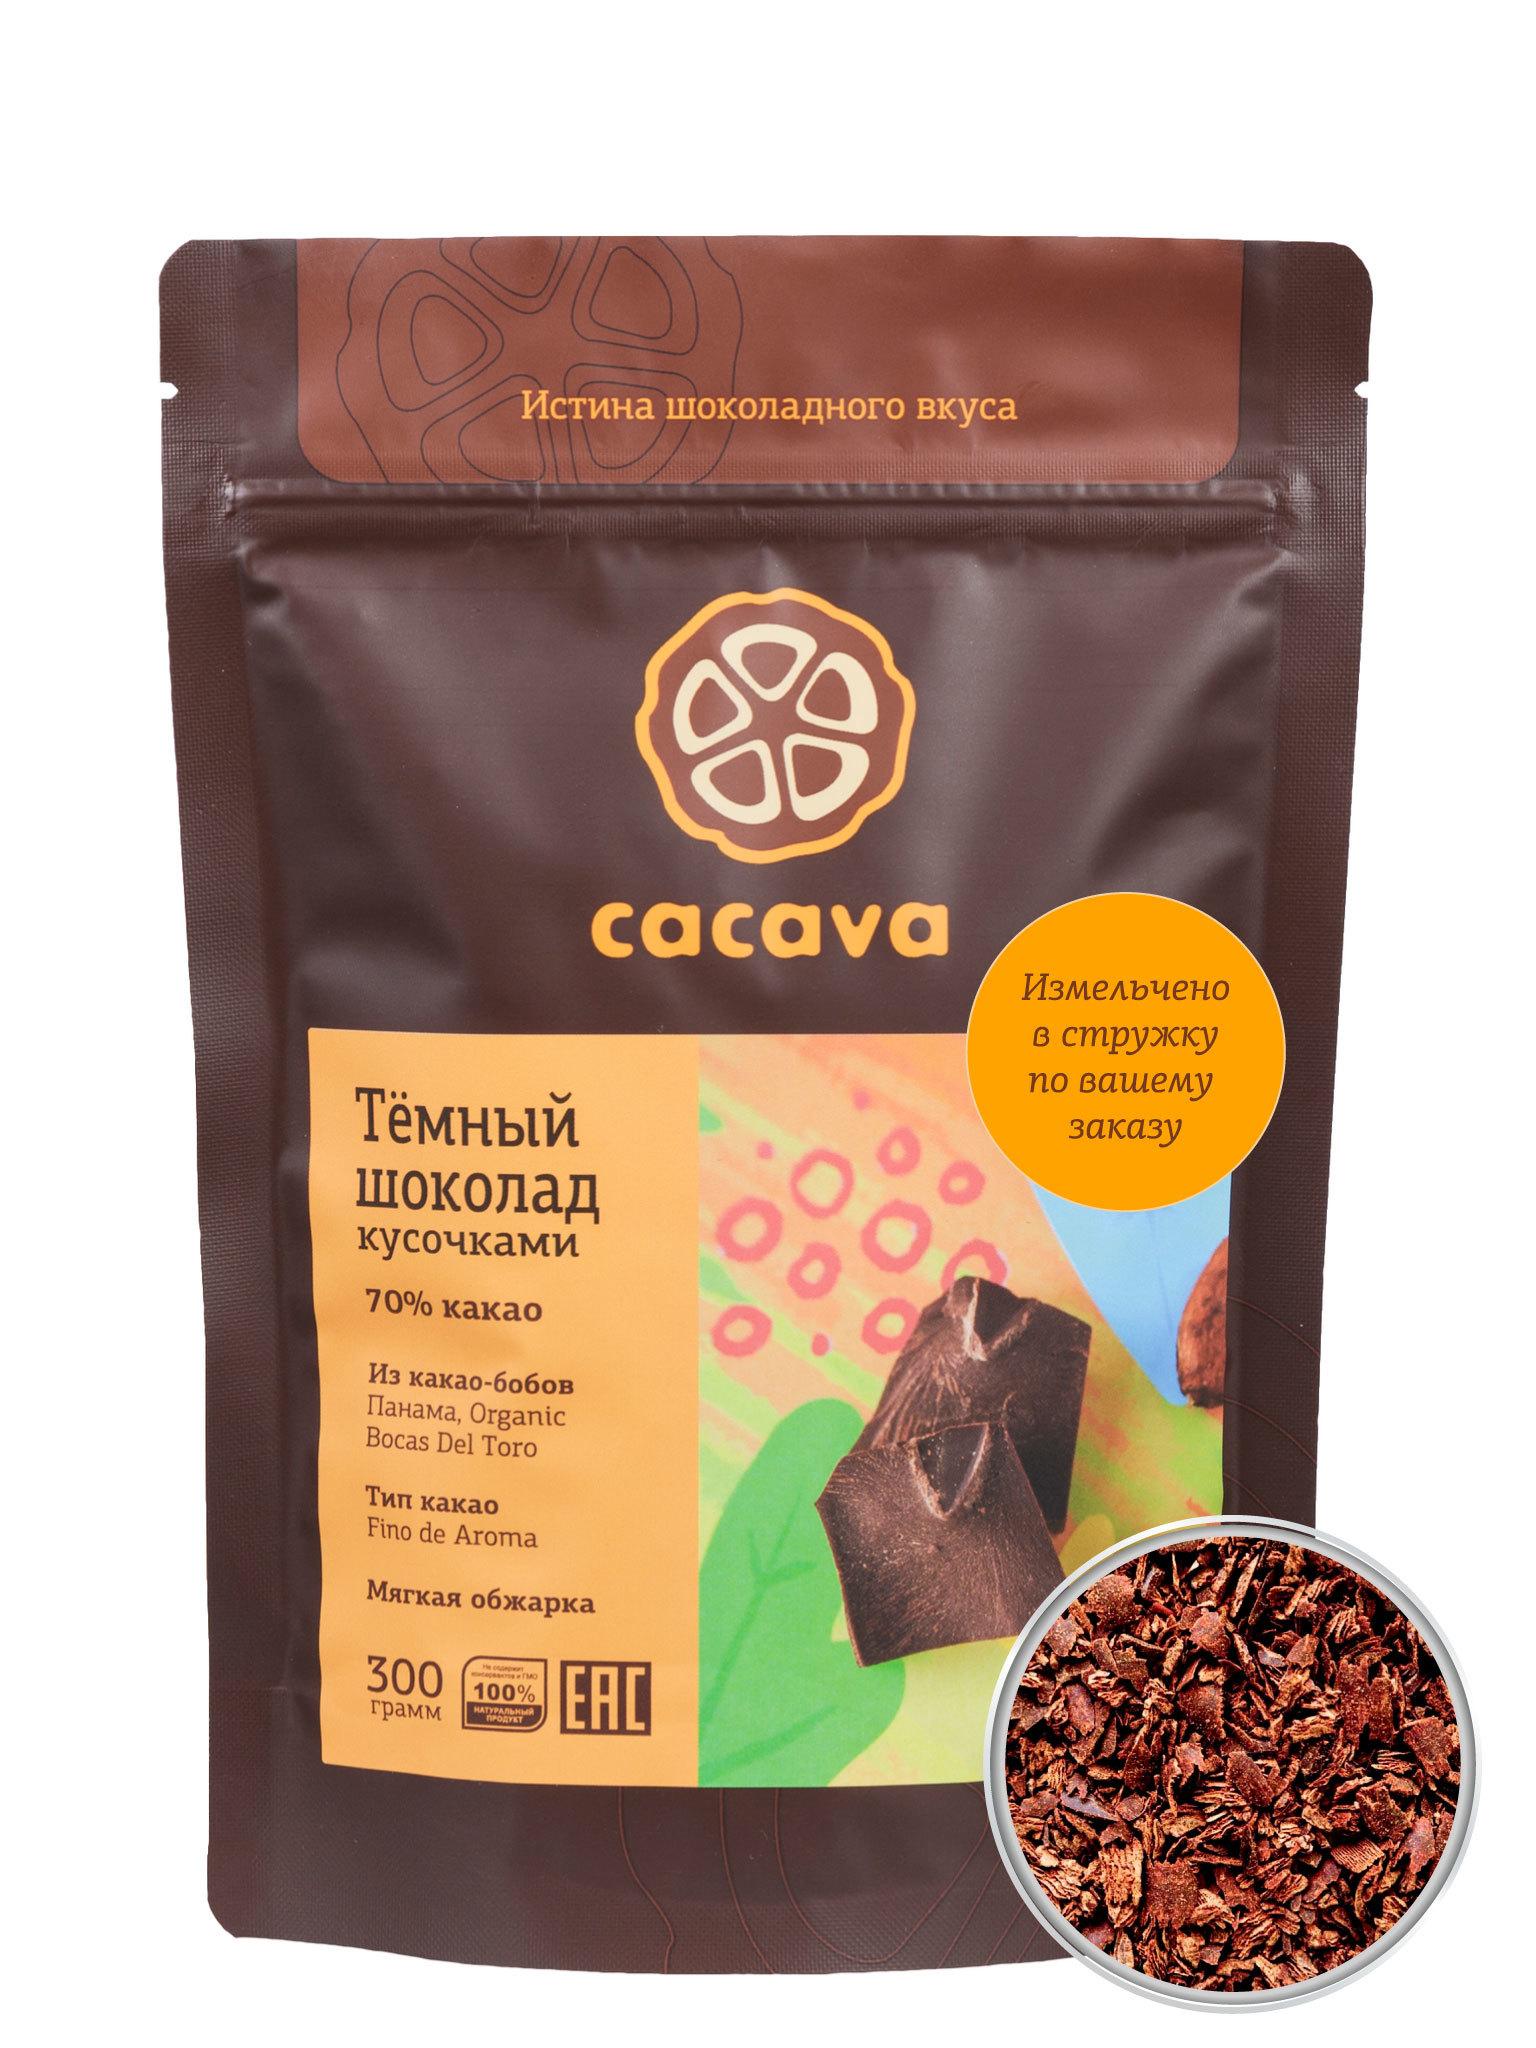 Тёмный шоколад 70 % какао с стружке (Панама), упаковка 300 грамм